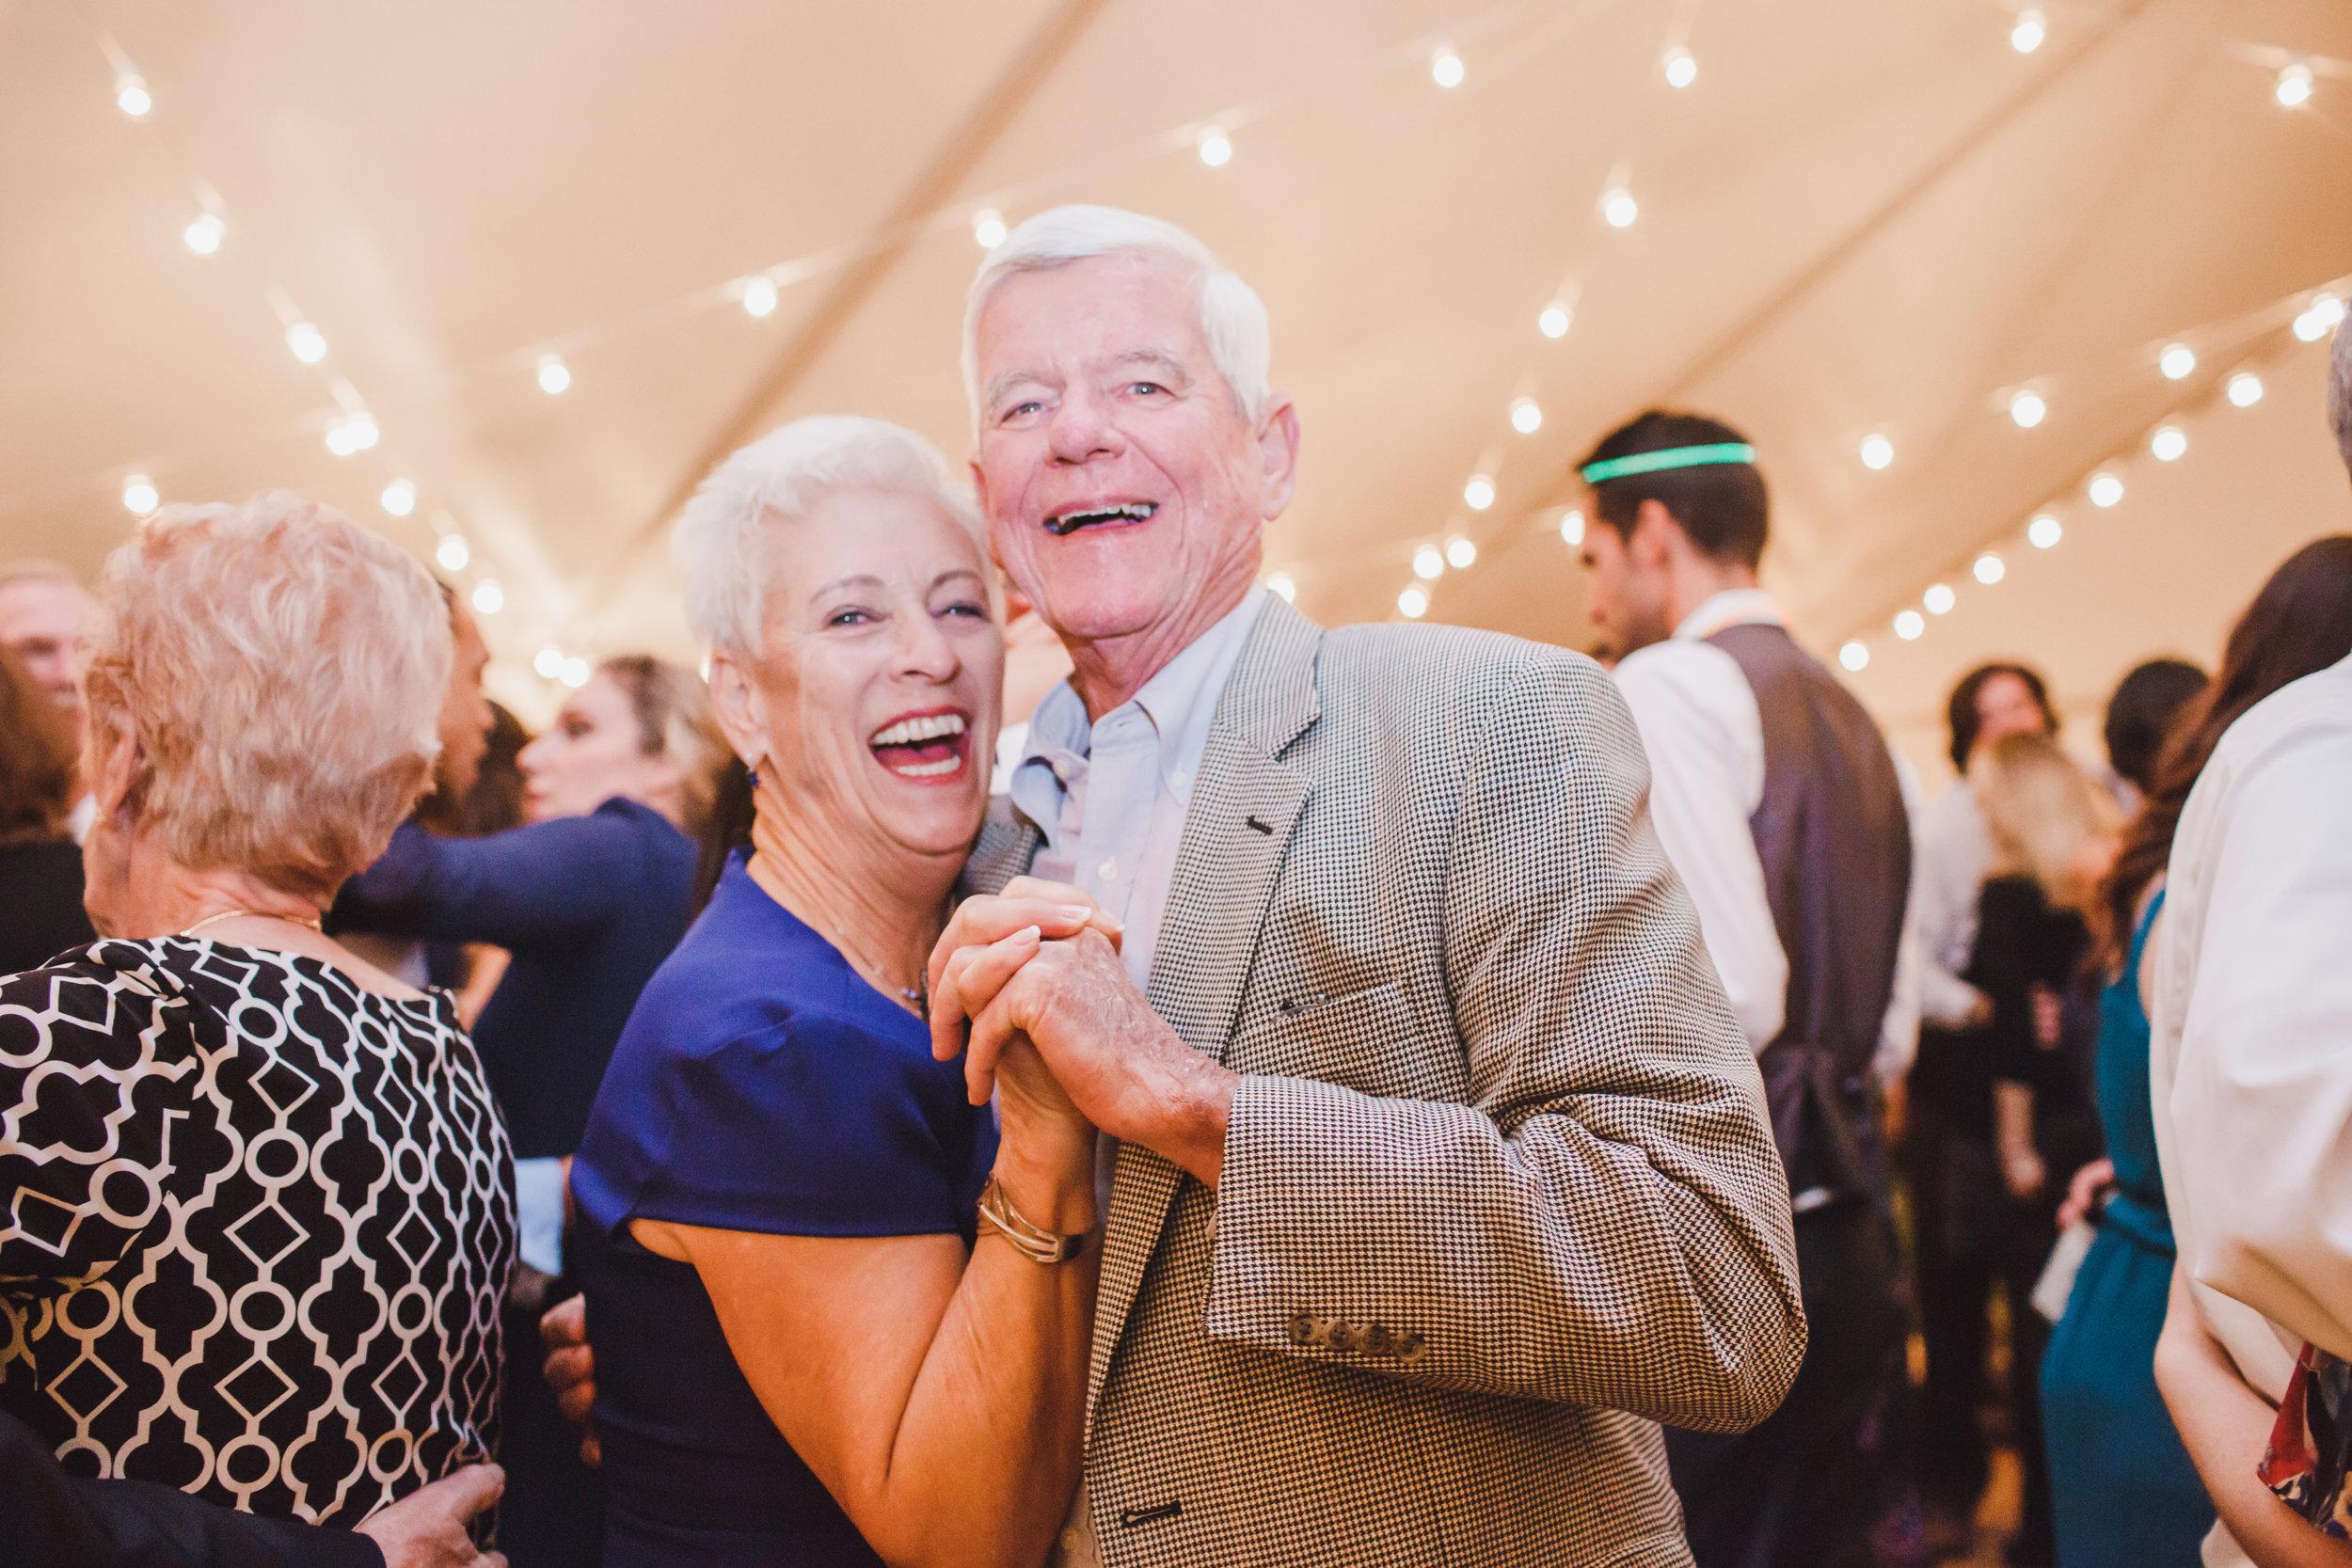 Fling - Virginia Wedding Photographer - Photography by Amy Nicole-1006-6.jpg